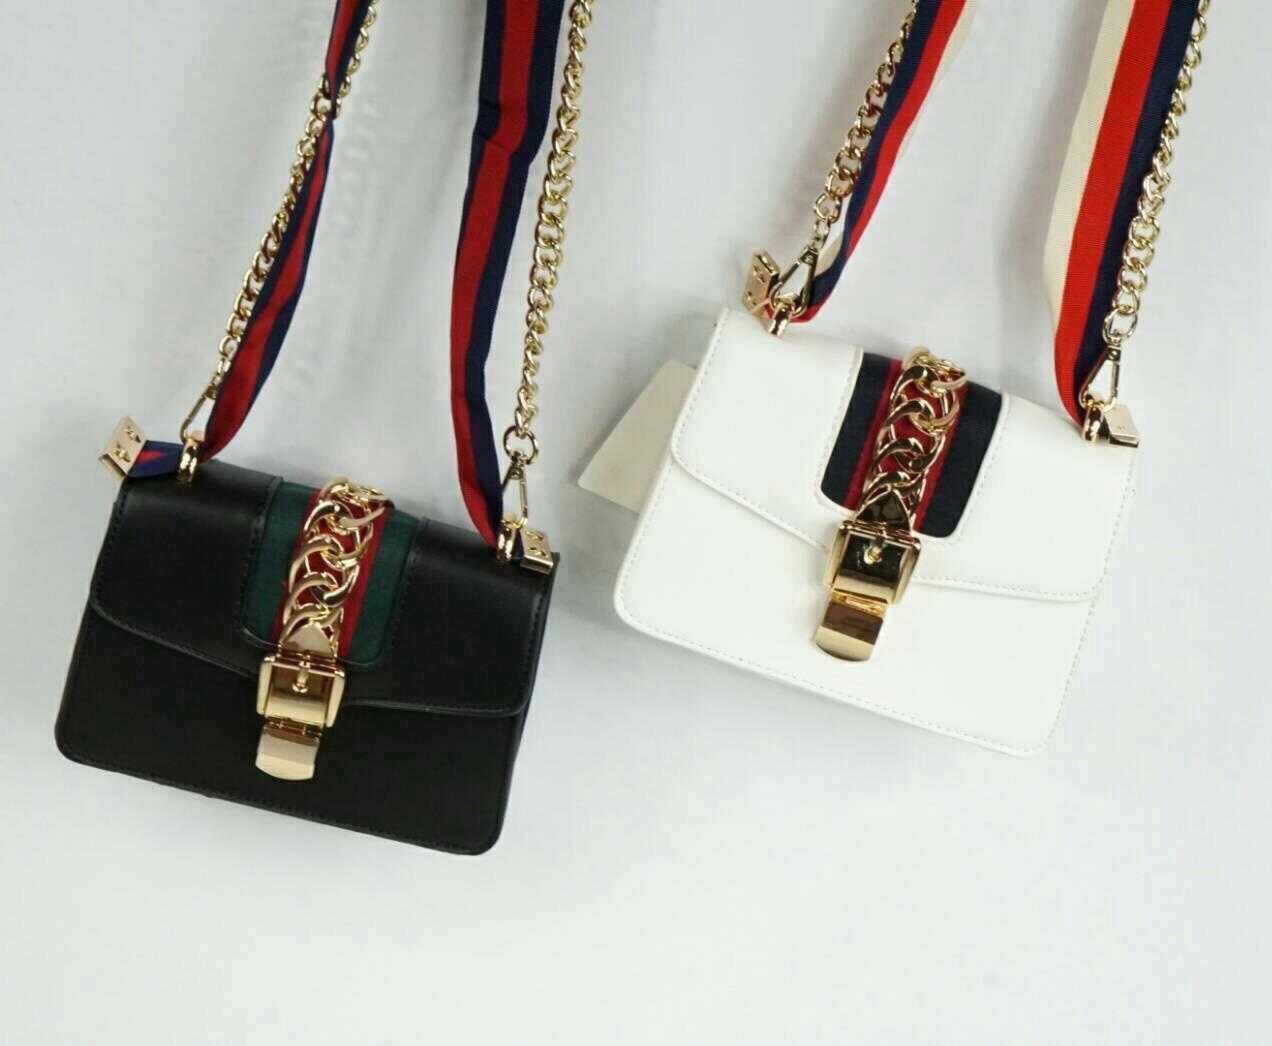 *Gucci Sylvie shoulder bag*